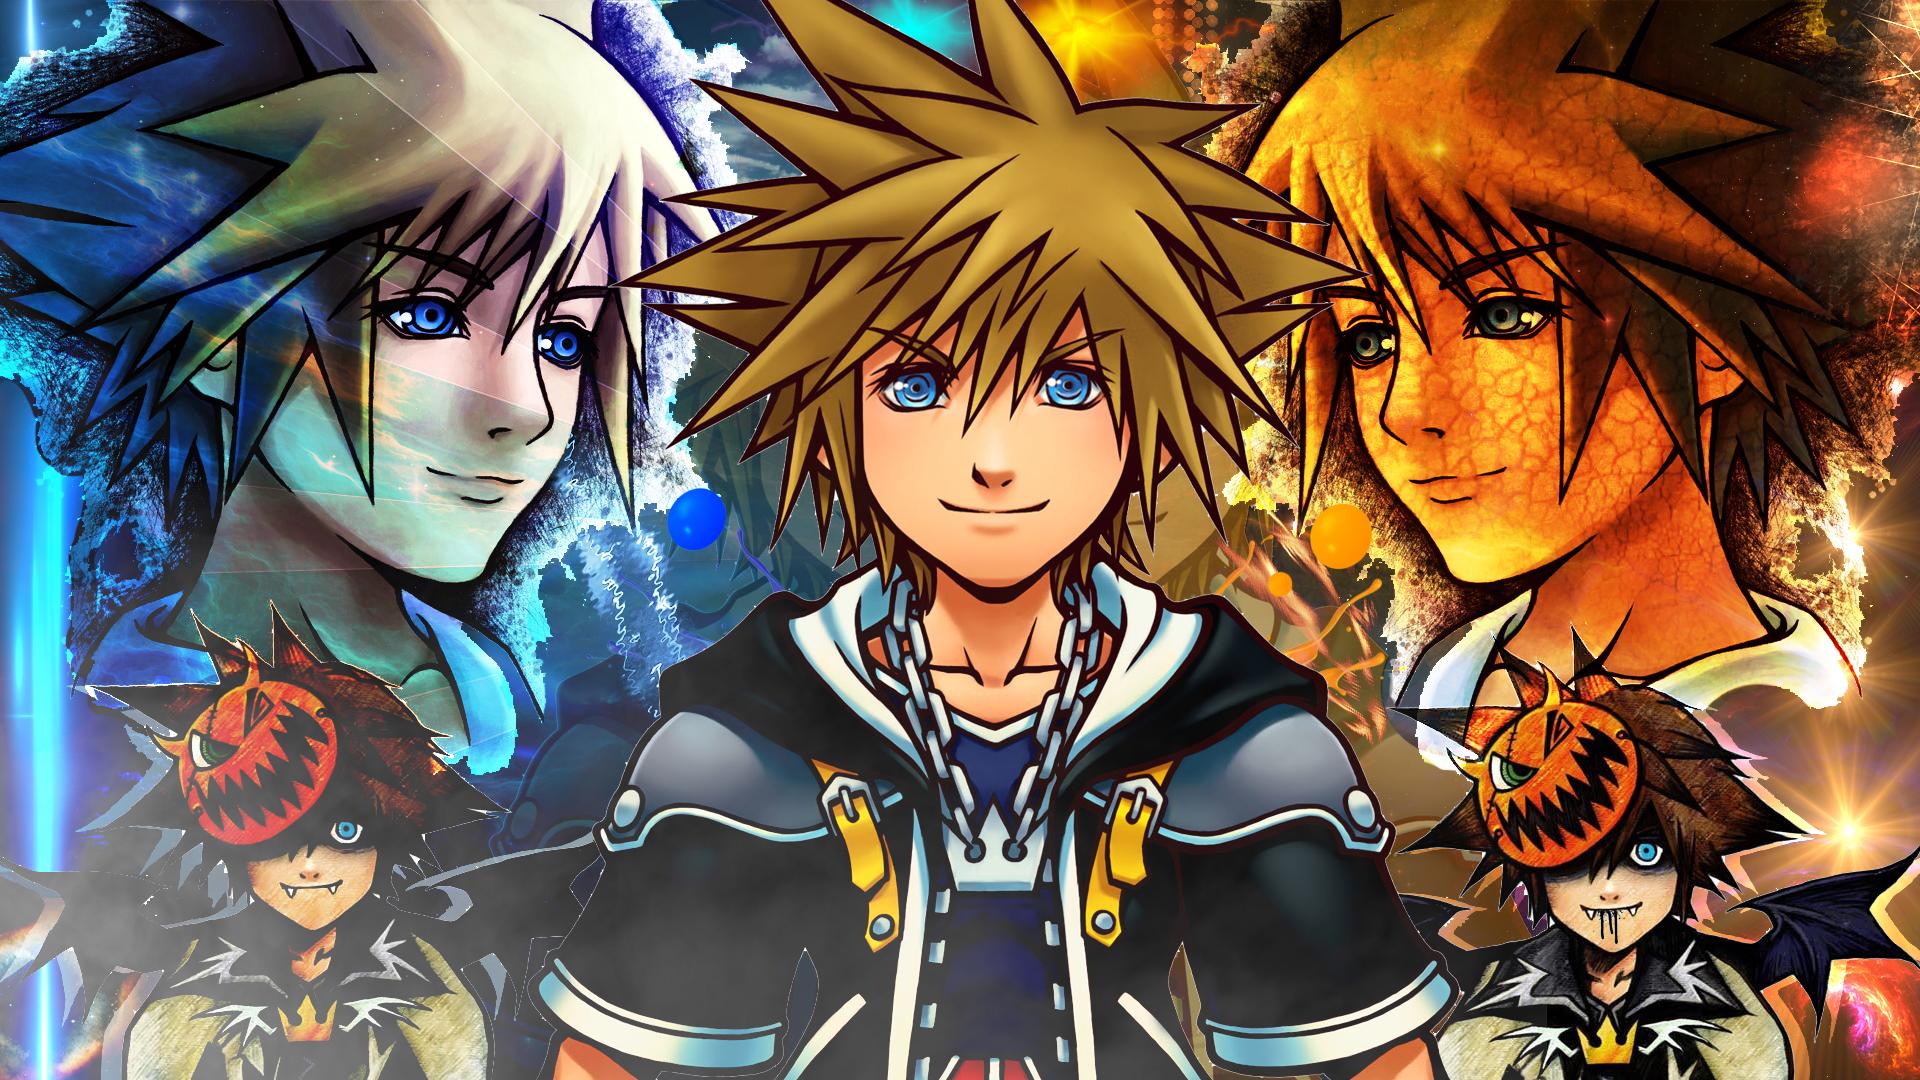 Kingdom Hearts 2 Sora Wallpaper By Soraa Game On Deviantart